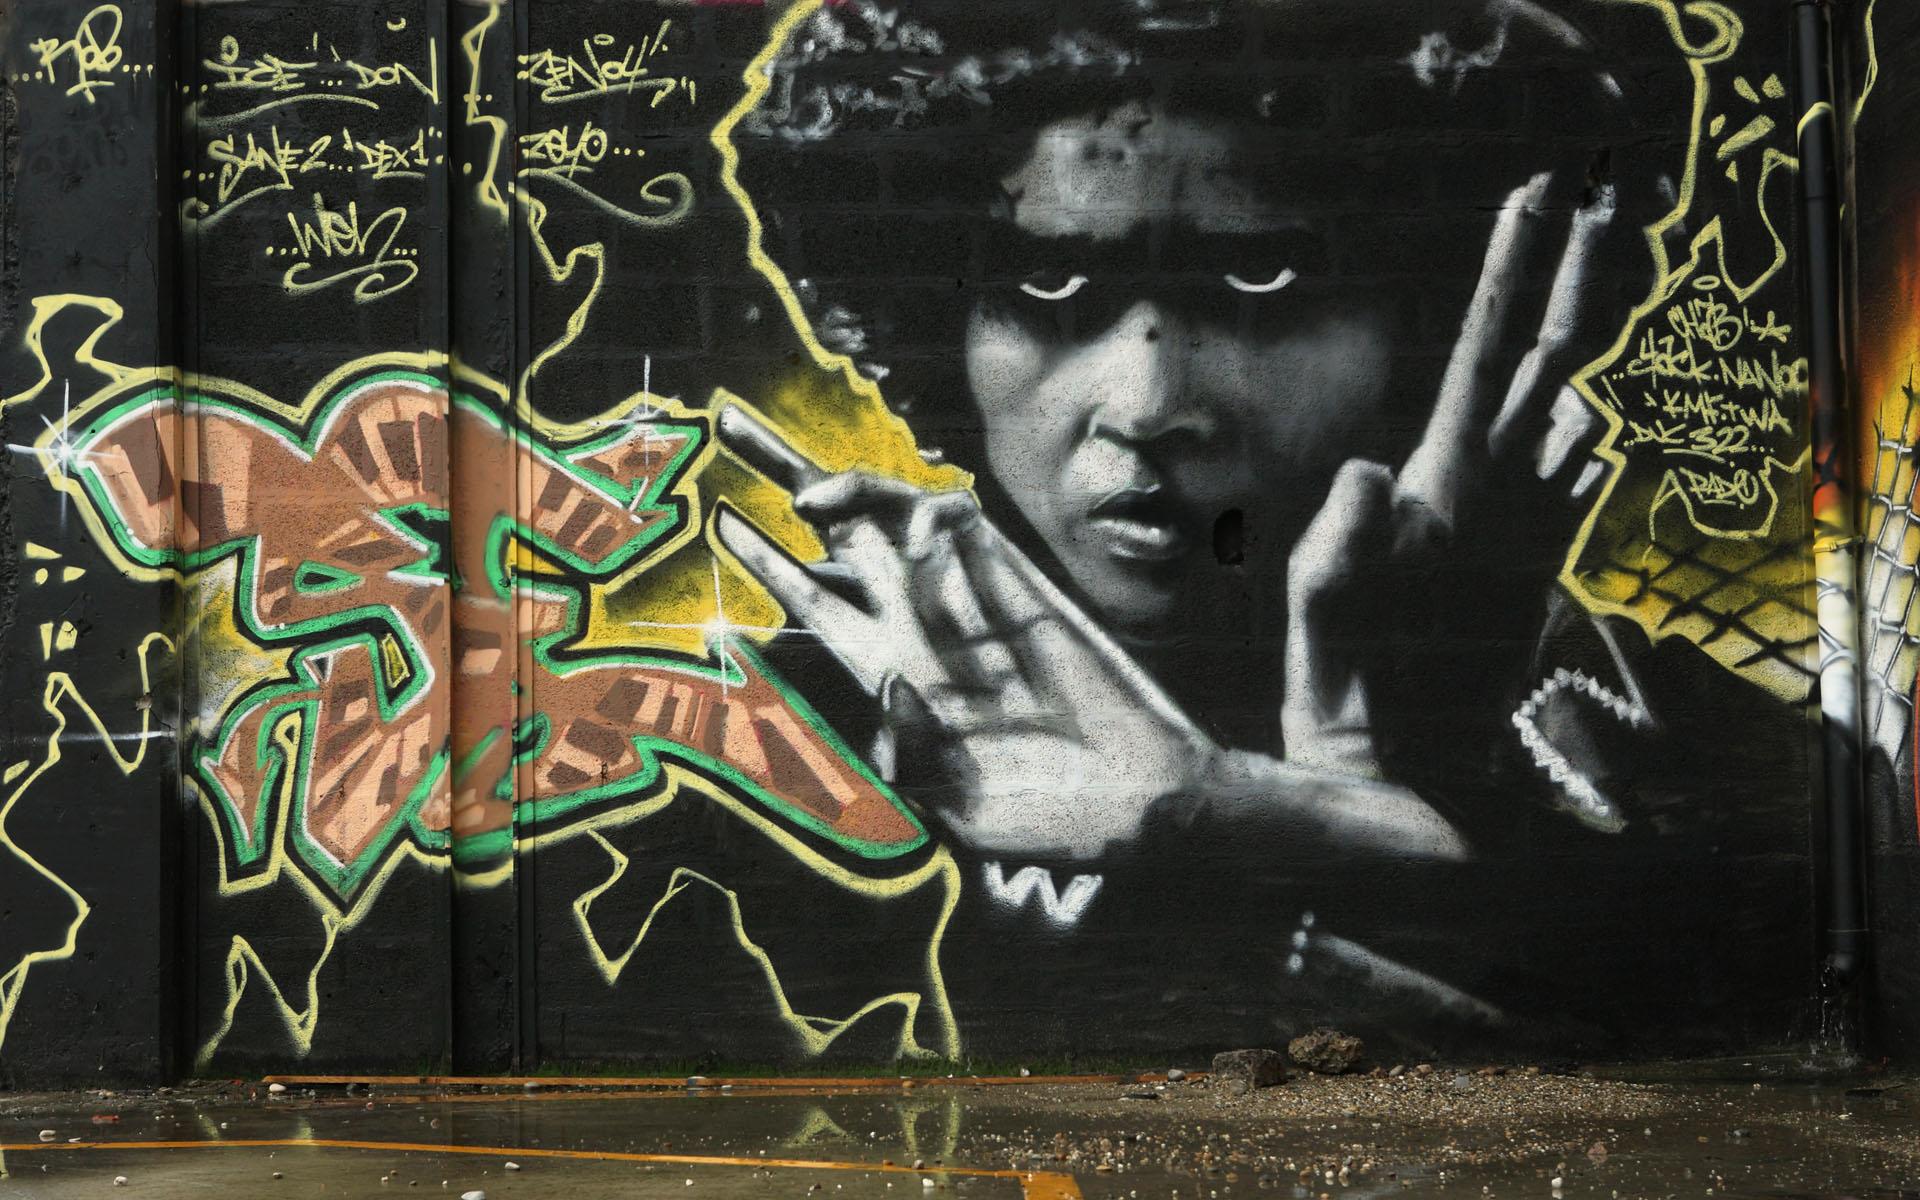 Graffikart-2012-visage